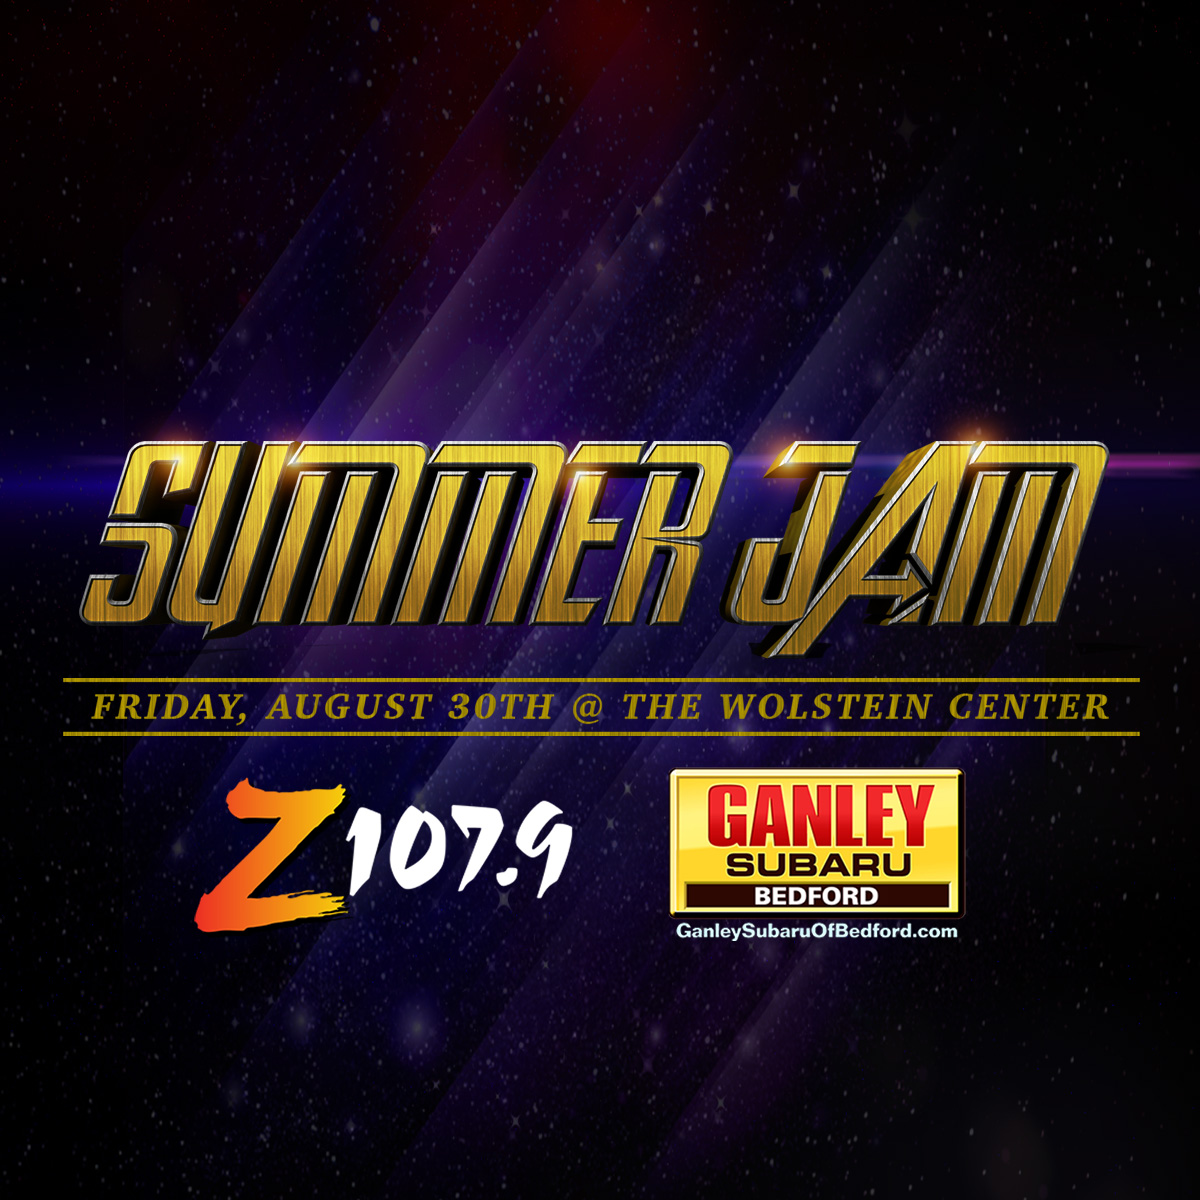 Cleveland Summer Jam 2019